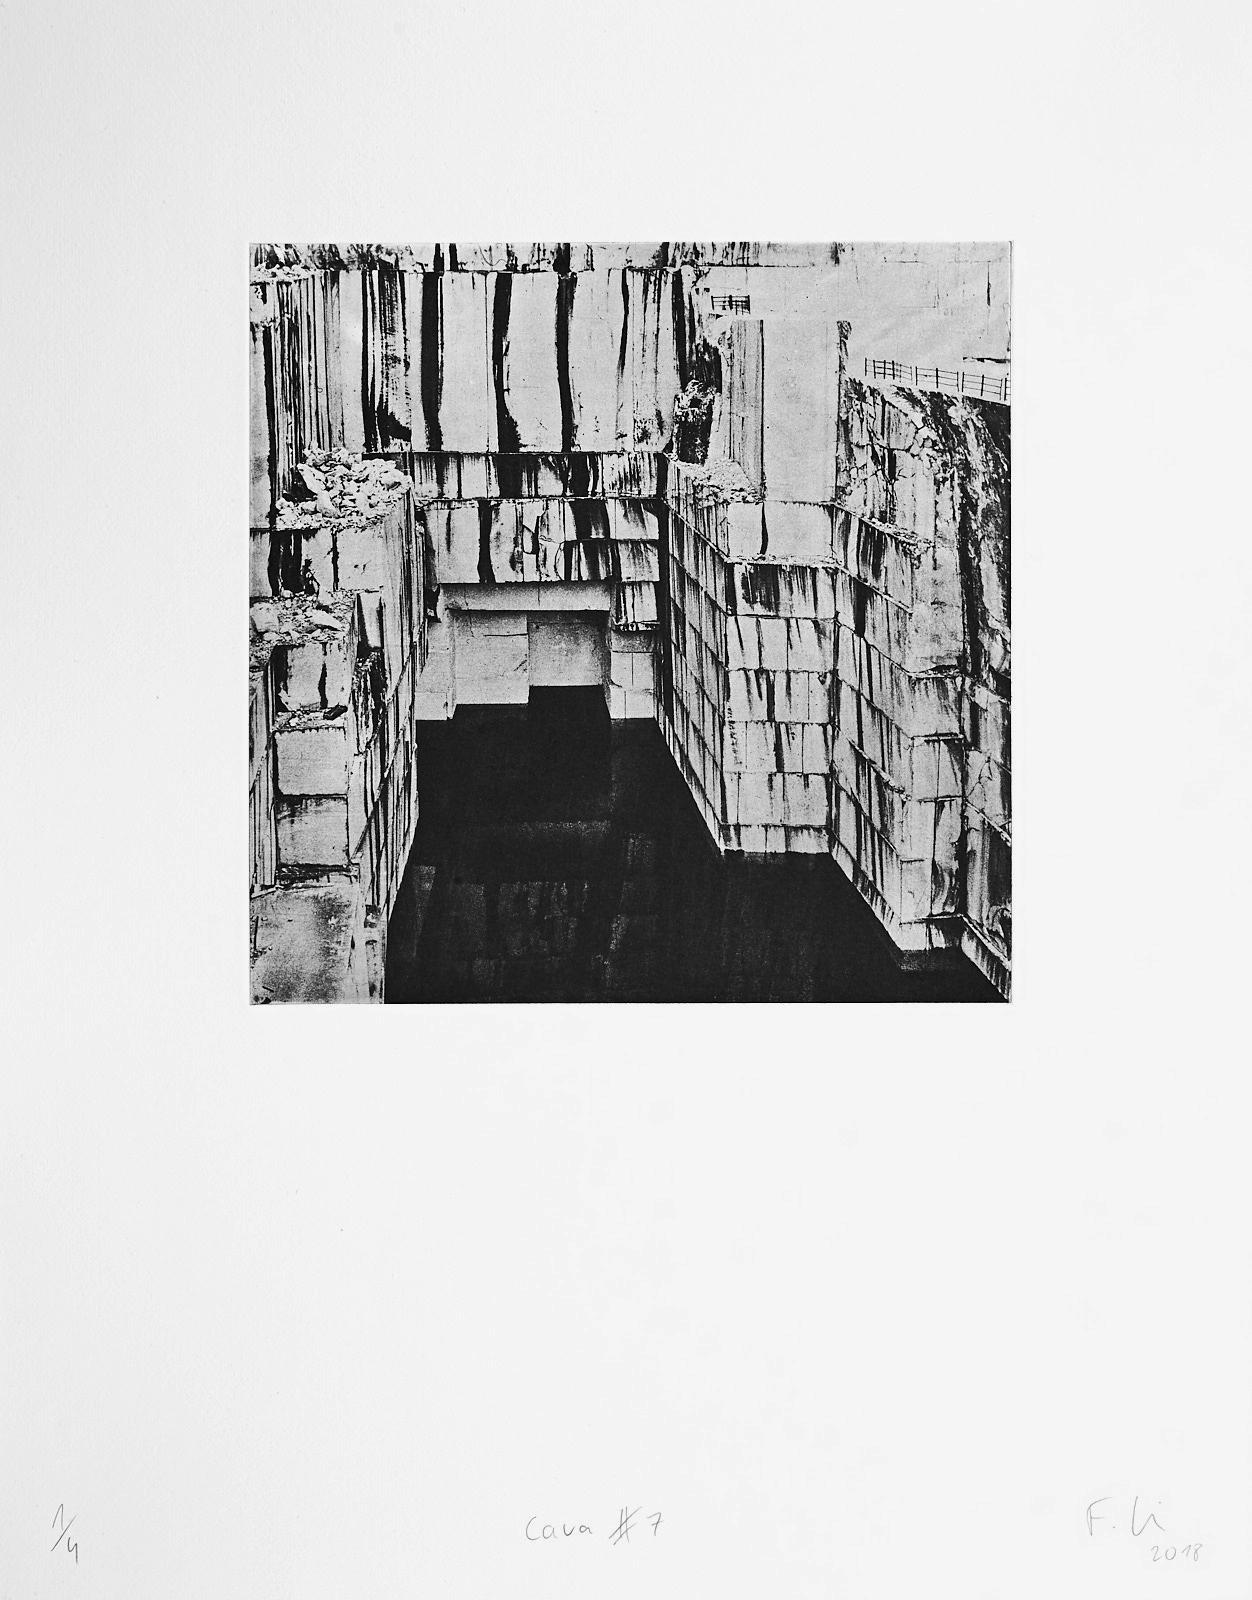 Cava #7 (2018)  medium: Photogravure  size: 36 x 46 cm  paper: Zerkall 270 g/qm  plate: 21.5 x 21.5 cm  edition: 7 copies  numbered: 1/4 - 4/4, 3 e.a.  printer: FWU